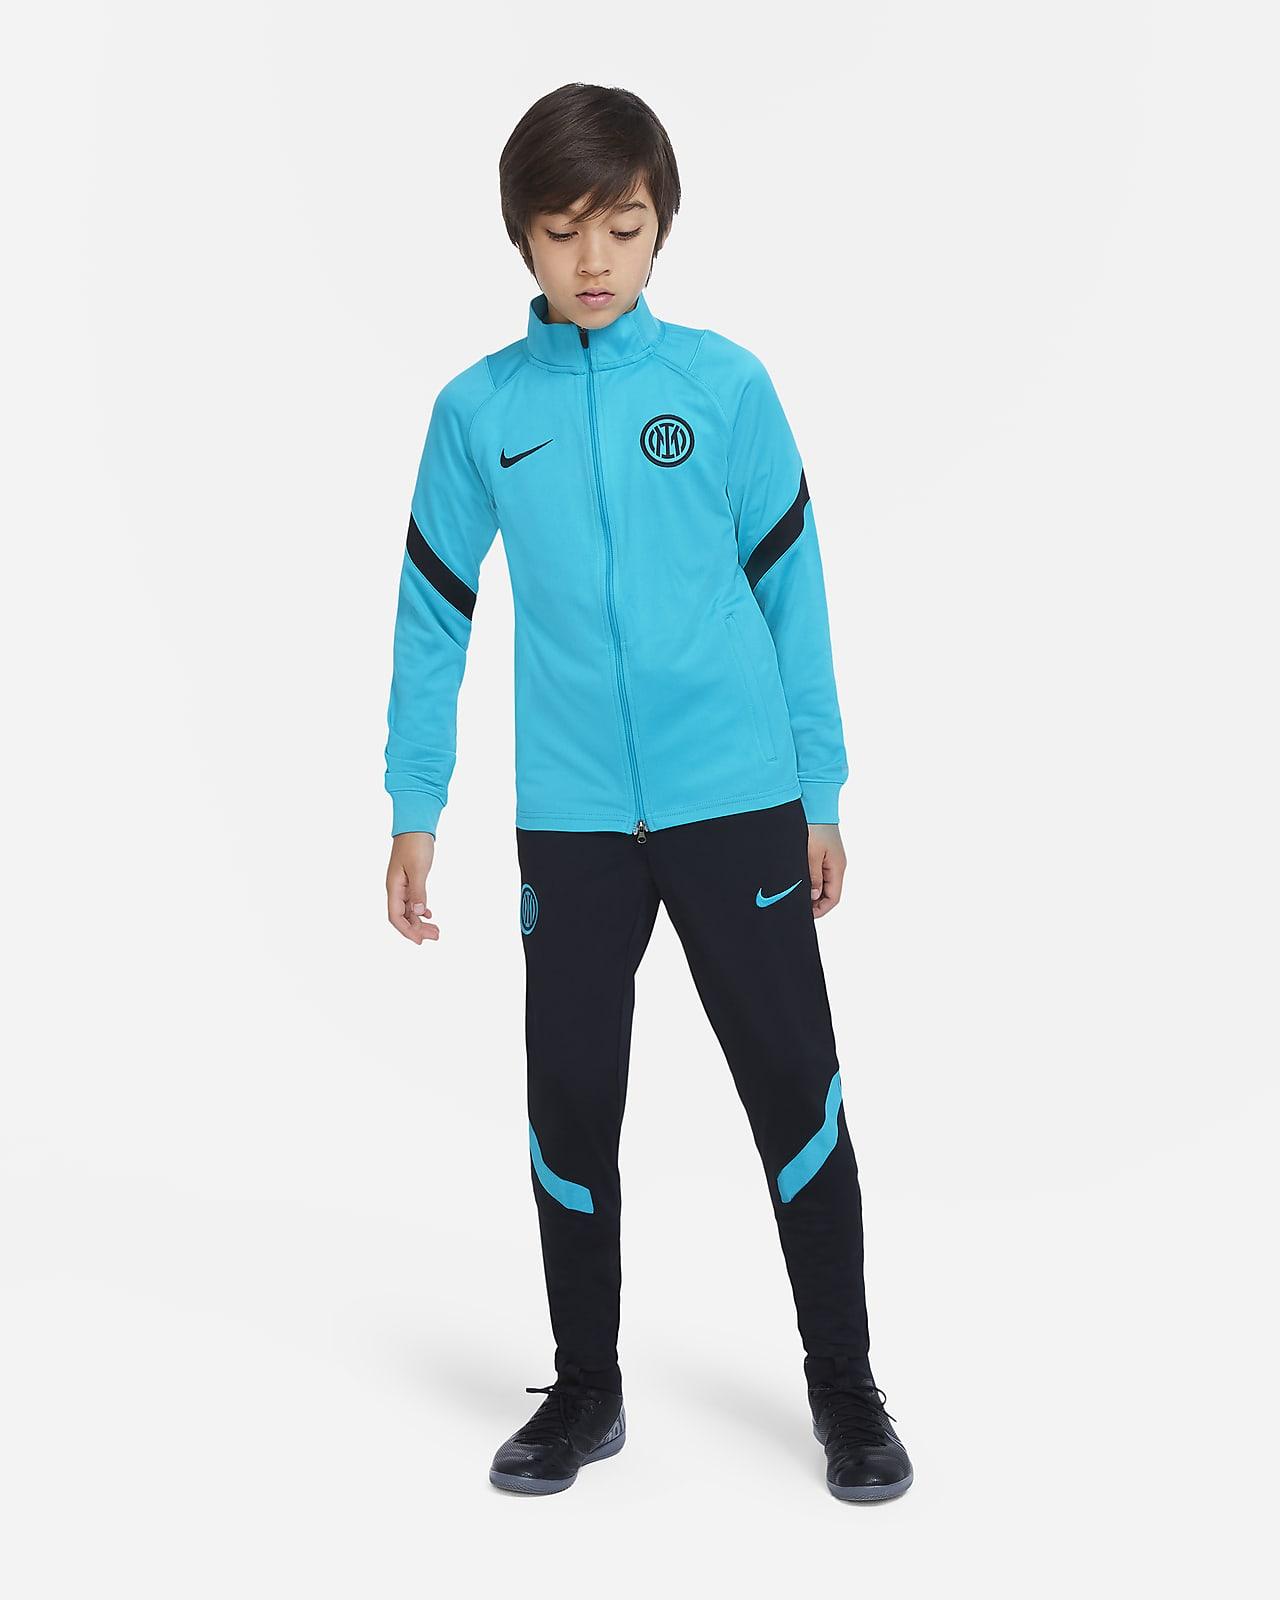 Inter Milan Strike Nike Dri-FIT Örgü Genç Çocuk Futbol Eşofmanı